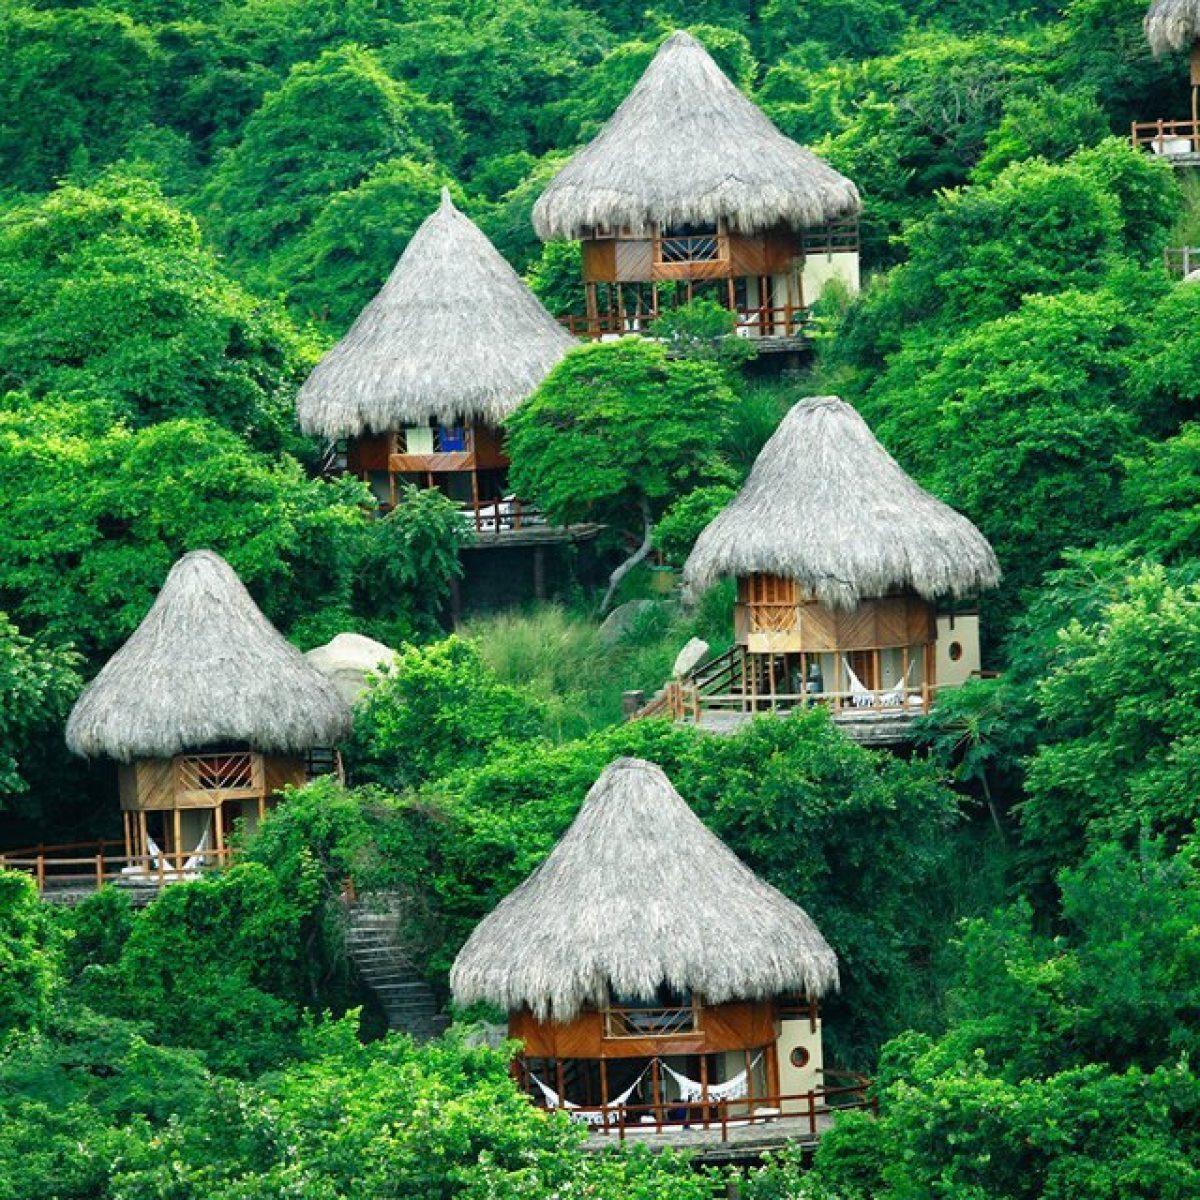 MYDAS TRAVEL SPECIALISTI IN COLOMBIA